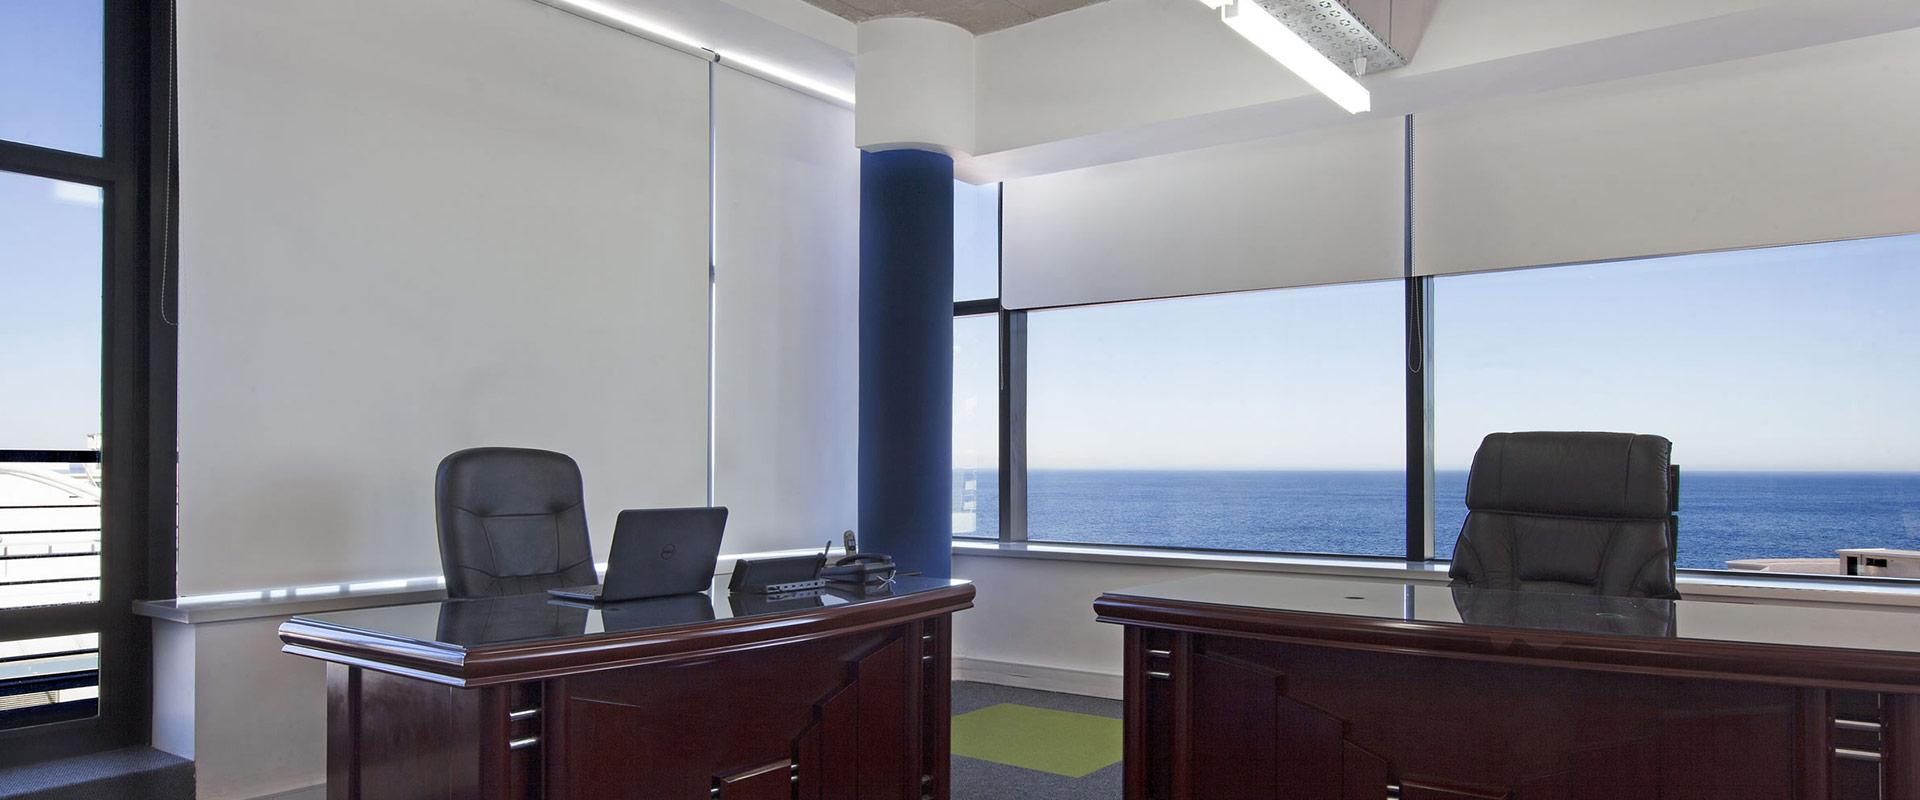 Office Roller Blinds | Sol Shutters & Blinds